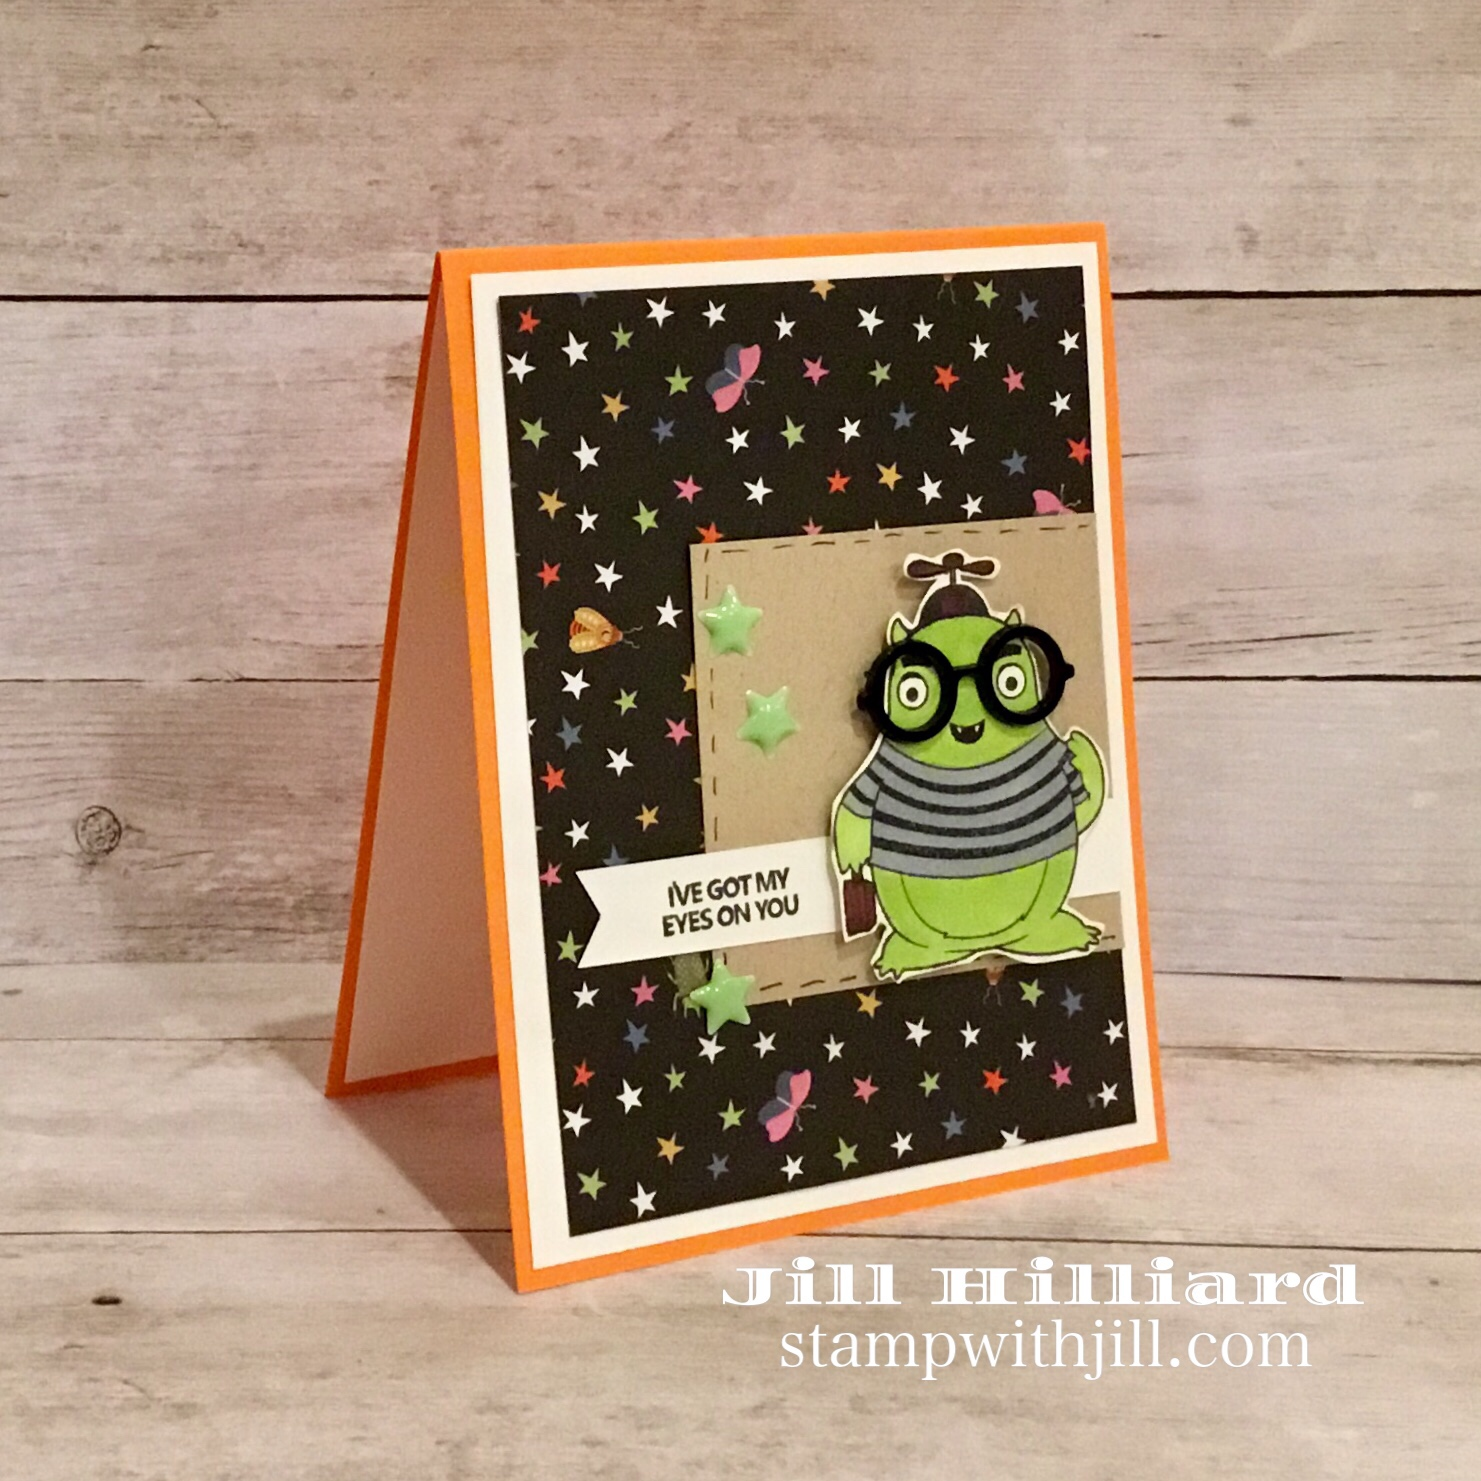 eyes-on-you-fun-stampers-journey-fsj-halloween-card-2